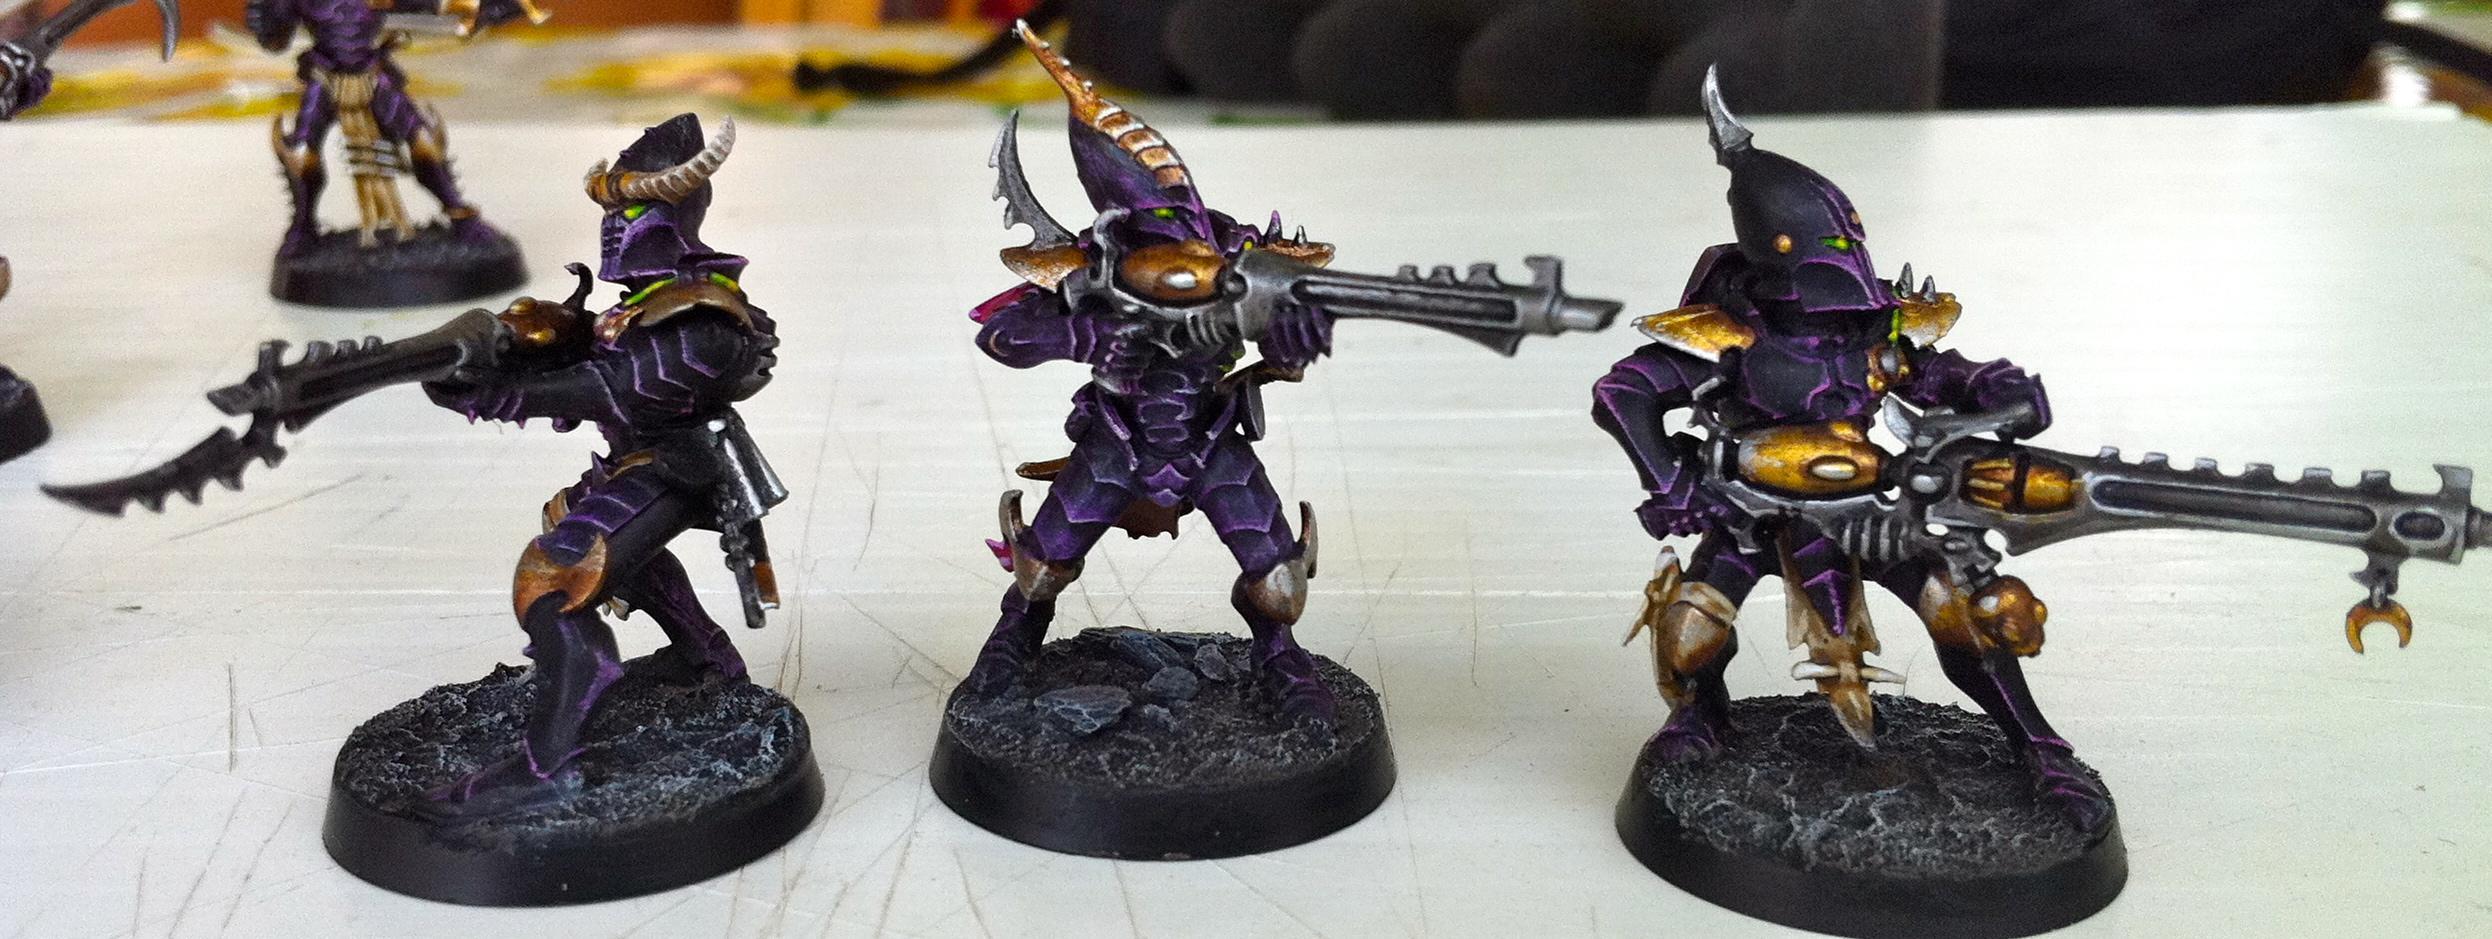 Dark Eldar, Kabalite, Kabalite Warriors, Warriors